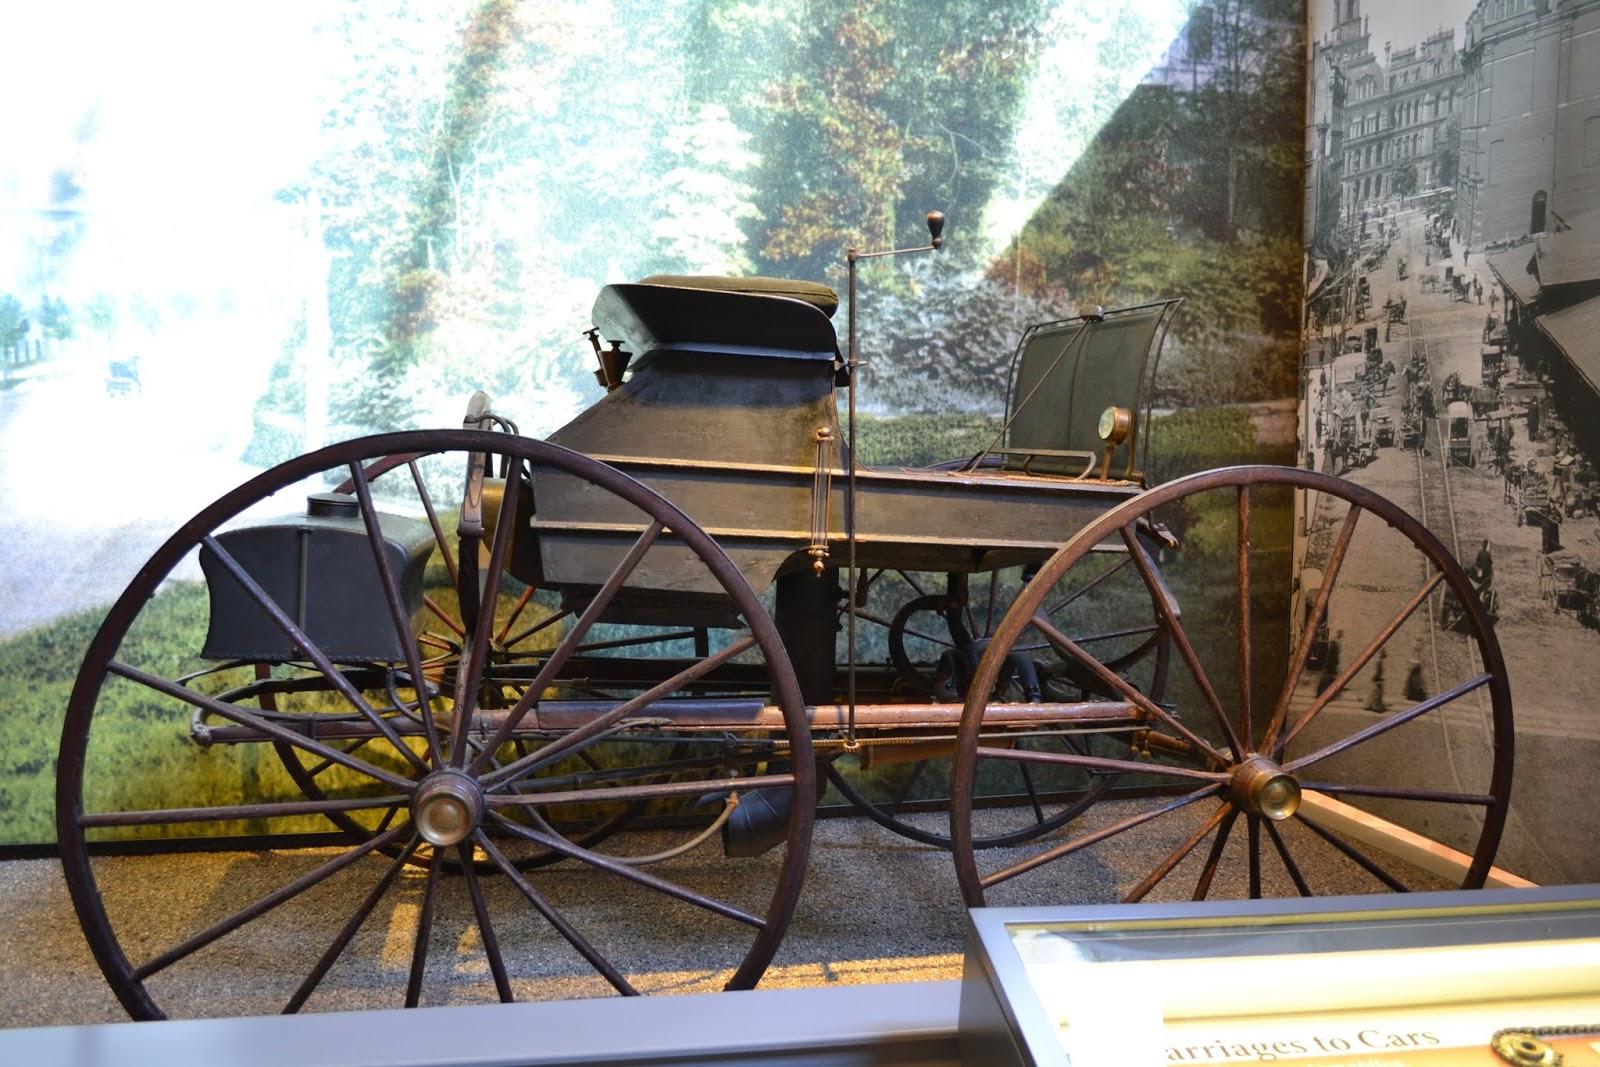 Roper 1865 года -  самый старый американский автомобиль доживший до наших дней. Музей Генри Форда. Дирборн, Мичиган (Henry Ford Museum, Dearborn, MI)